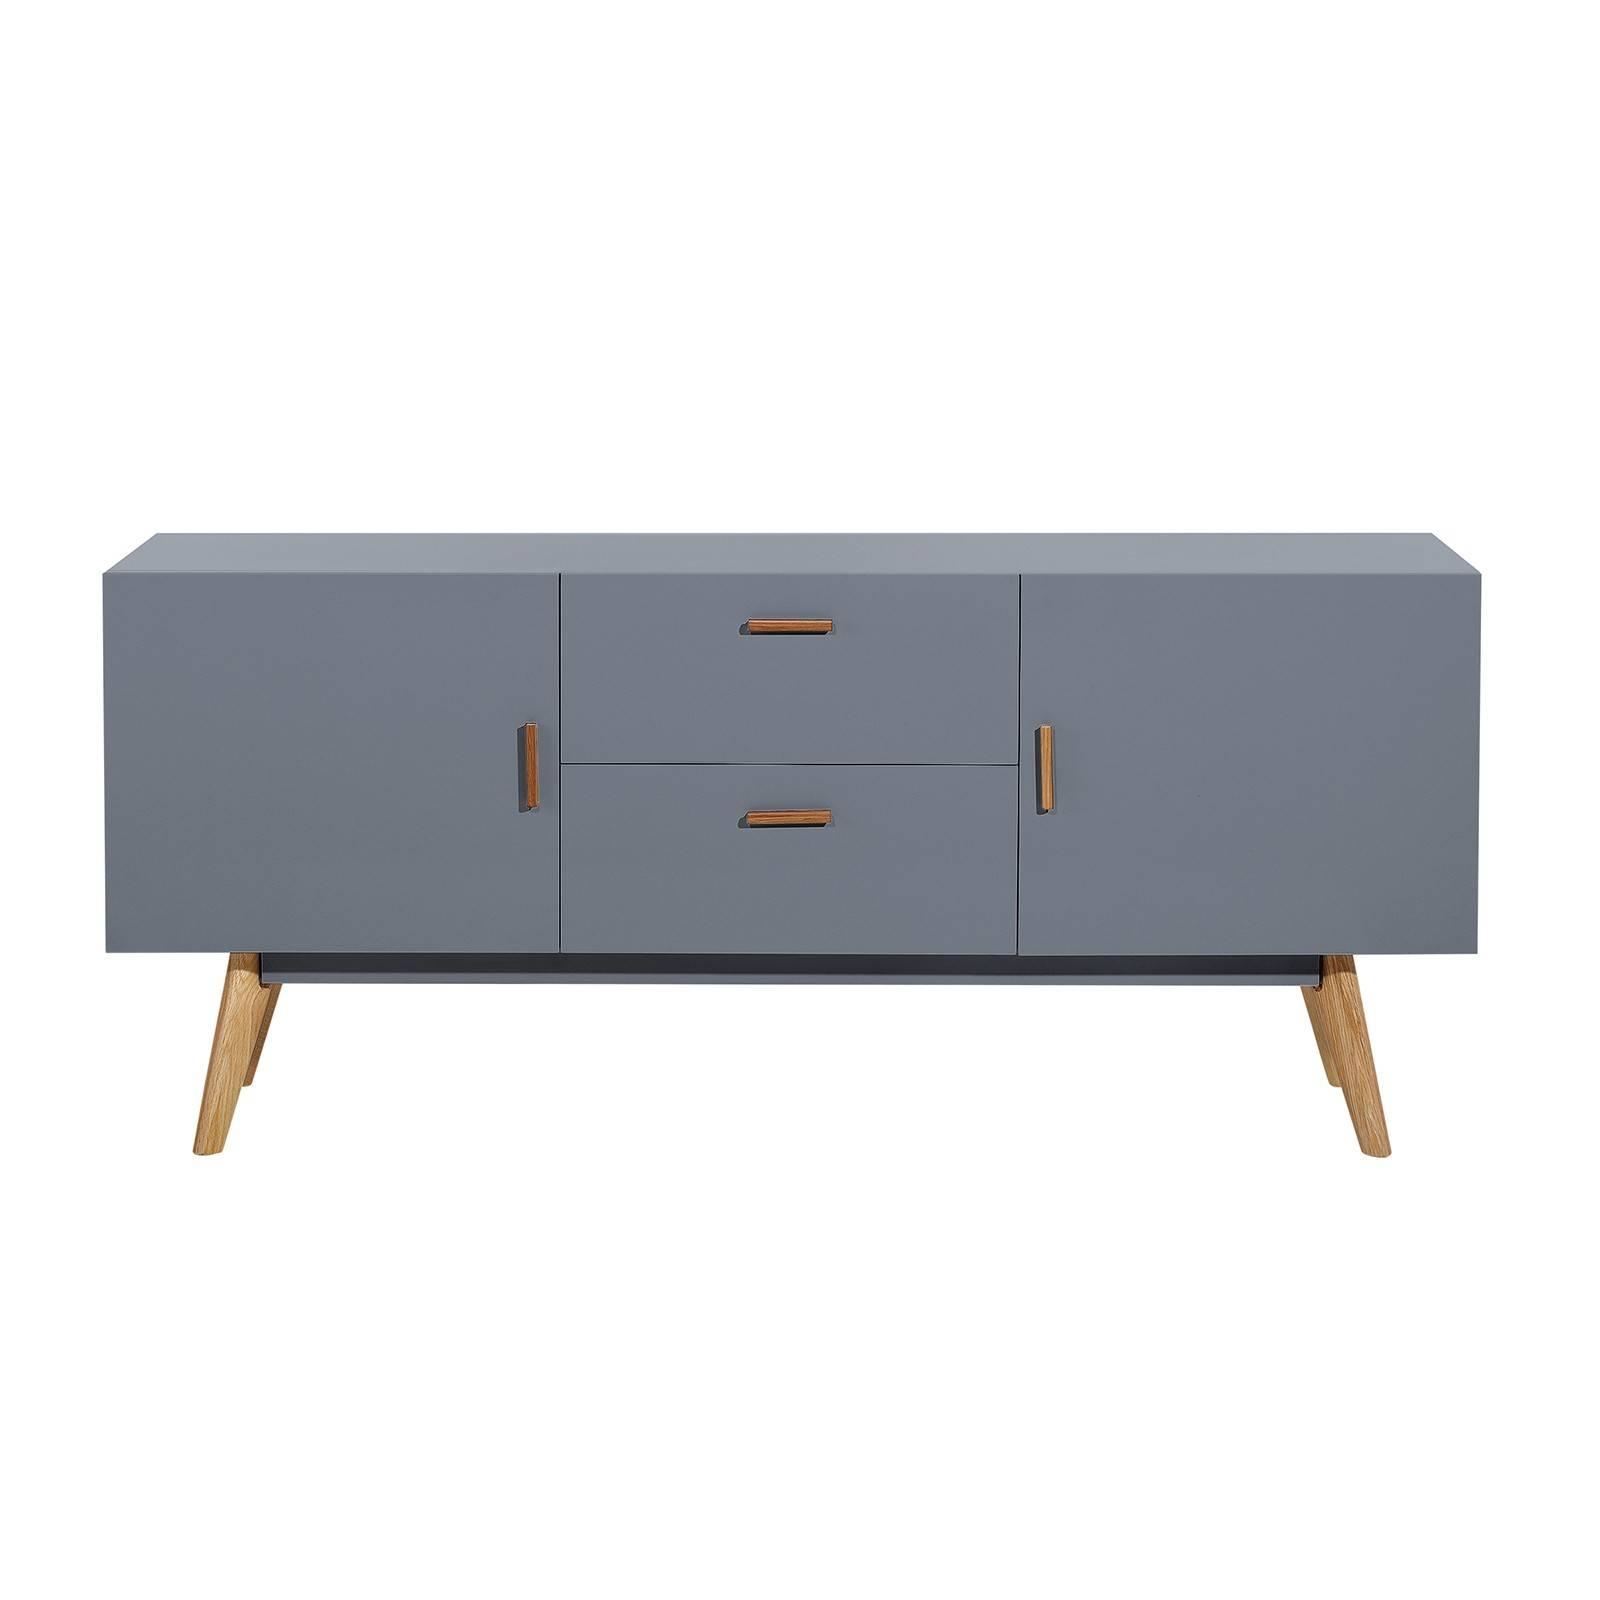 Scandinavian Retro Style White Sideboard Abreo Home Furniture Regarding Scandinavian Sideboards (View 11 of 15)